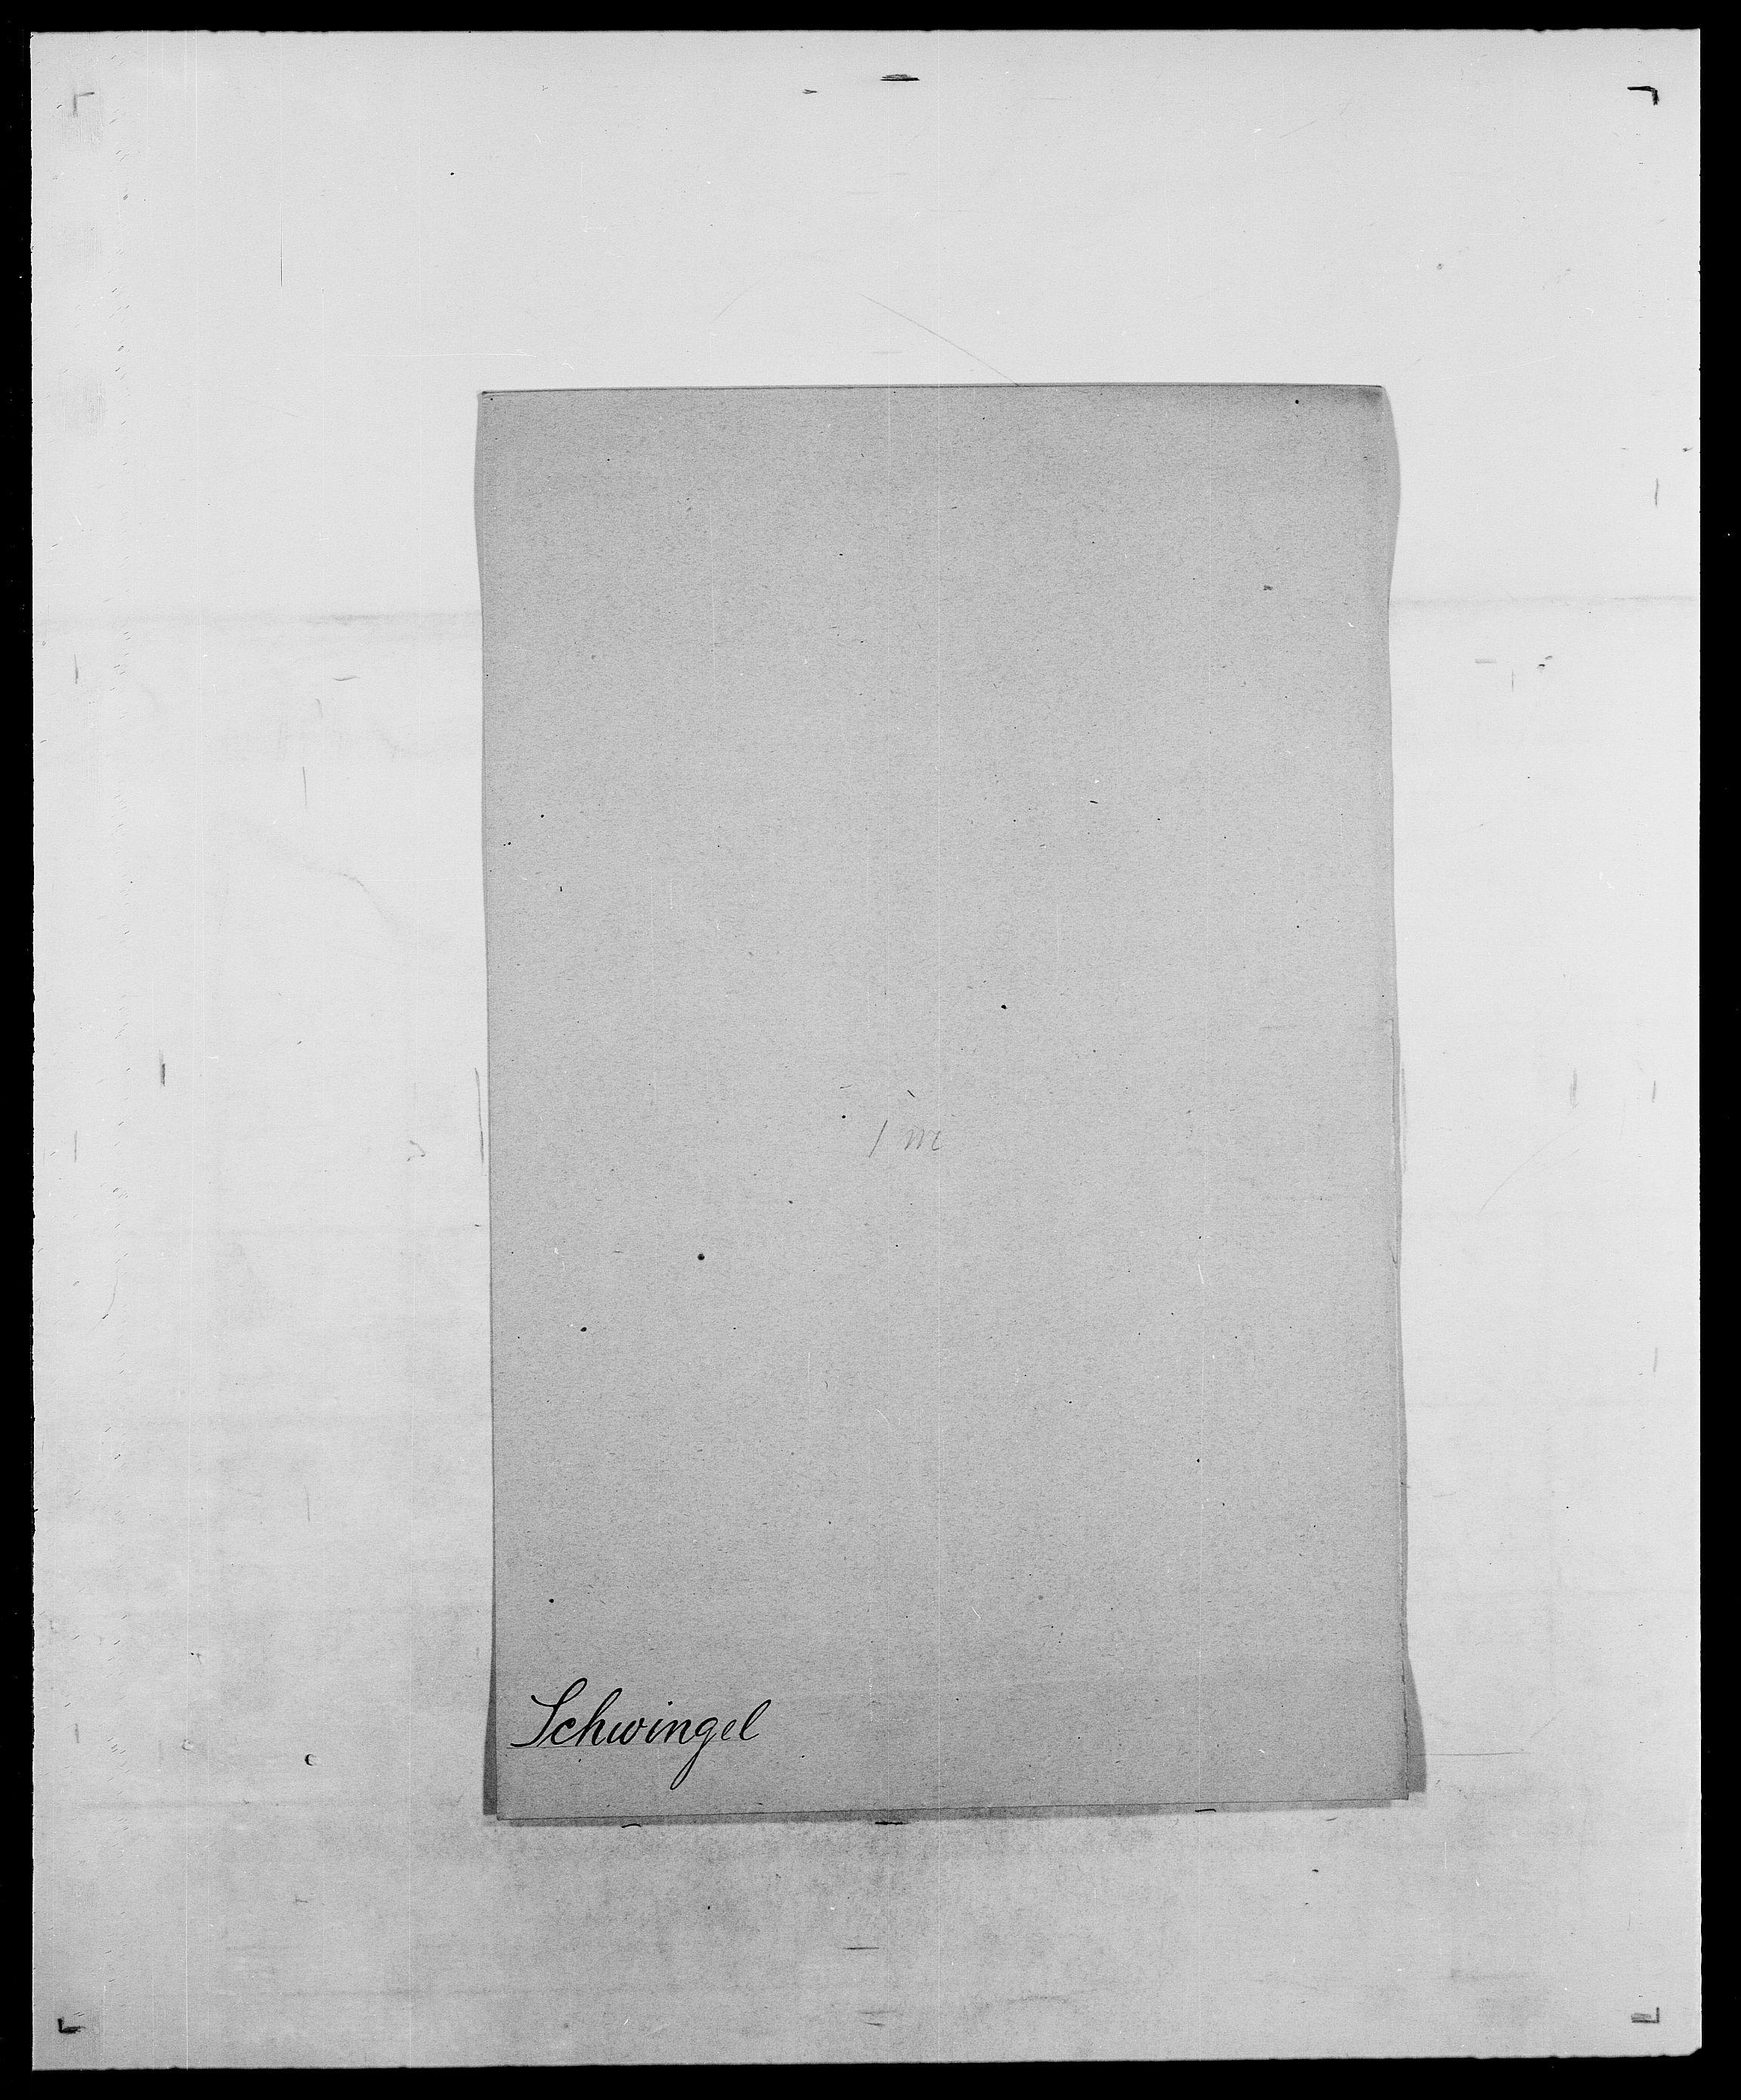 SAO, Delgobe, Charles Antoine - samling, D/Da/L0035: Schnabel - sjetman, s. 418